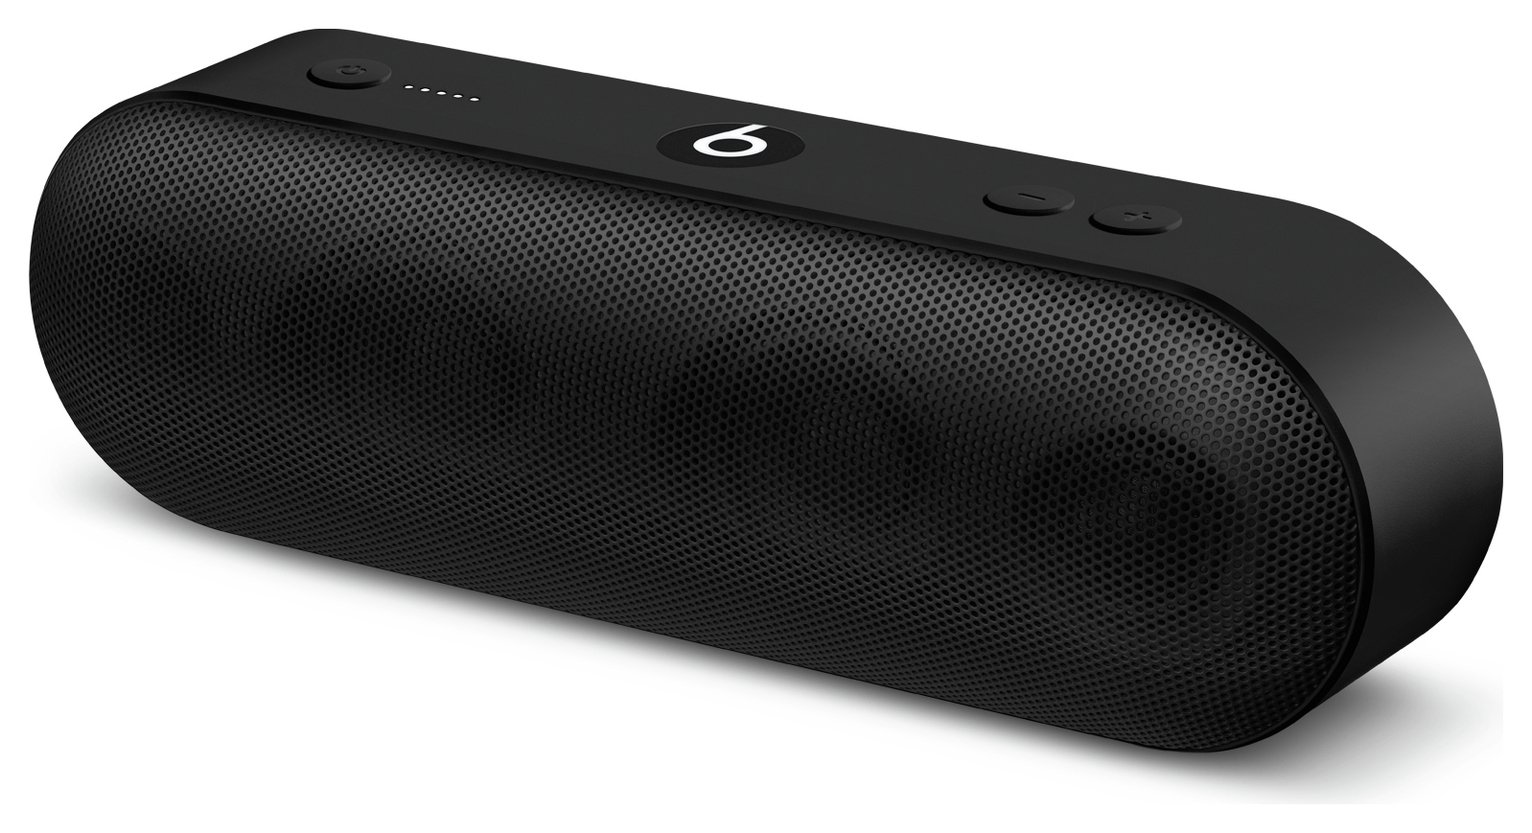 beats bluetooth speakers. click to zoom beats bluetooth speakers c